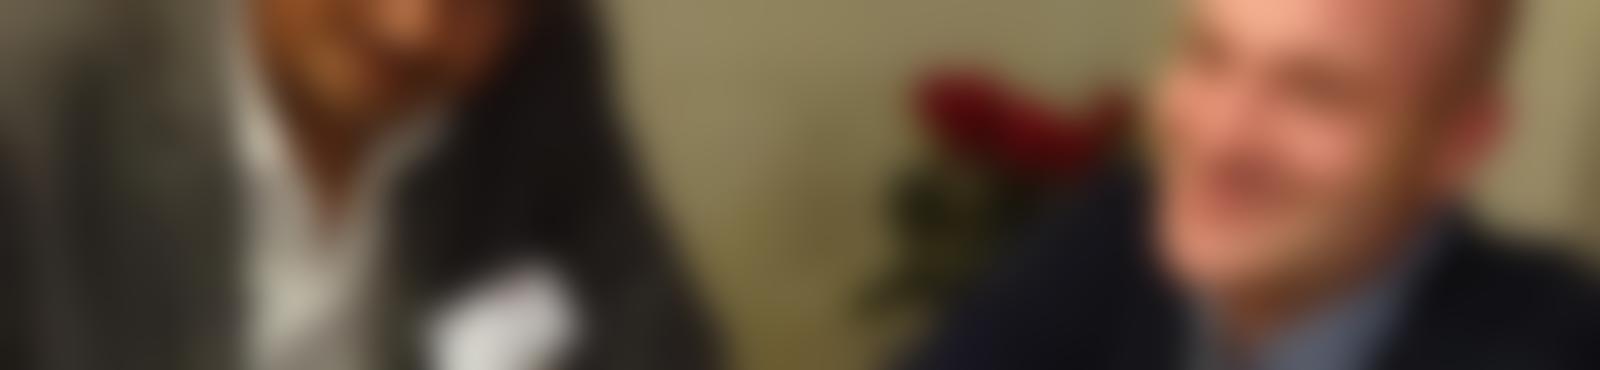 Blurred 9e0bda00 b43a 4d51 a337 a883f014c97c